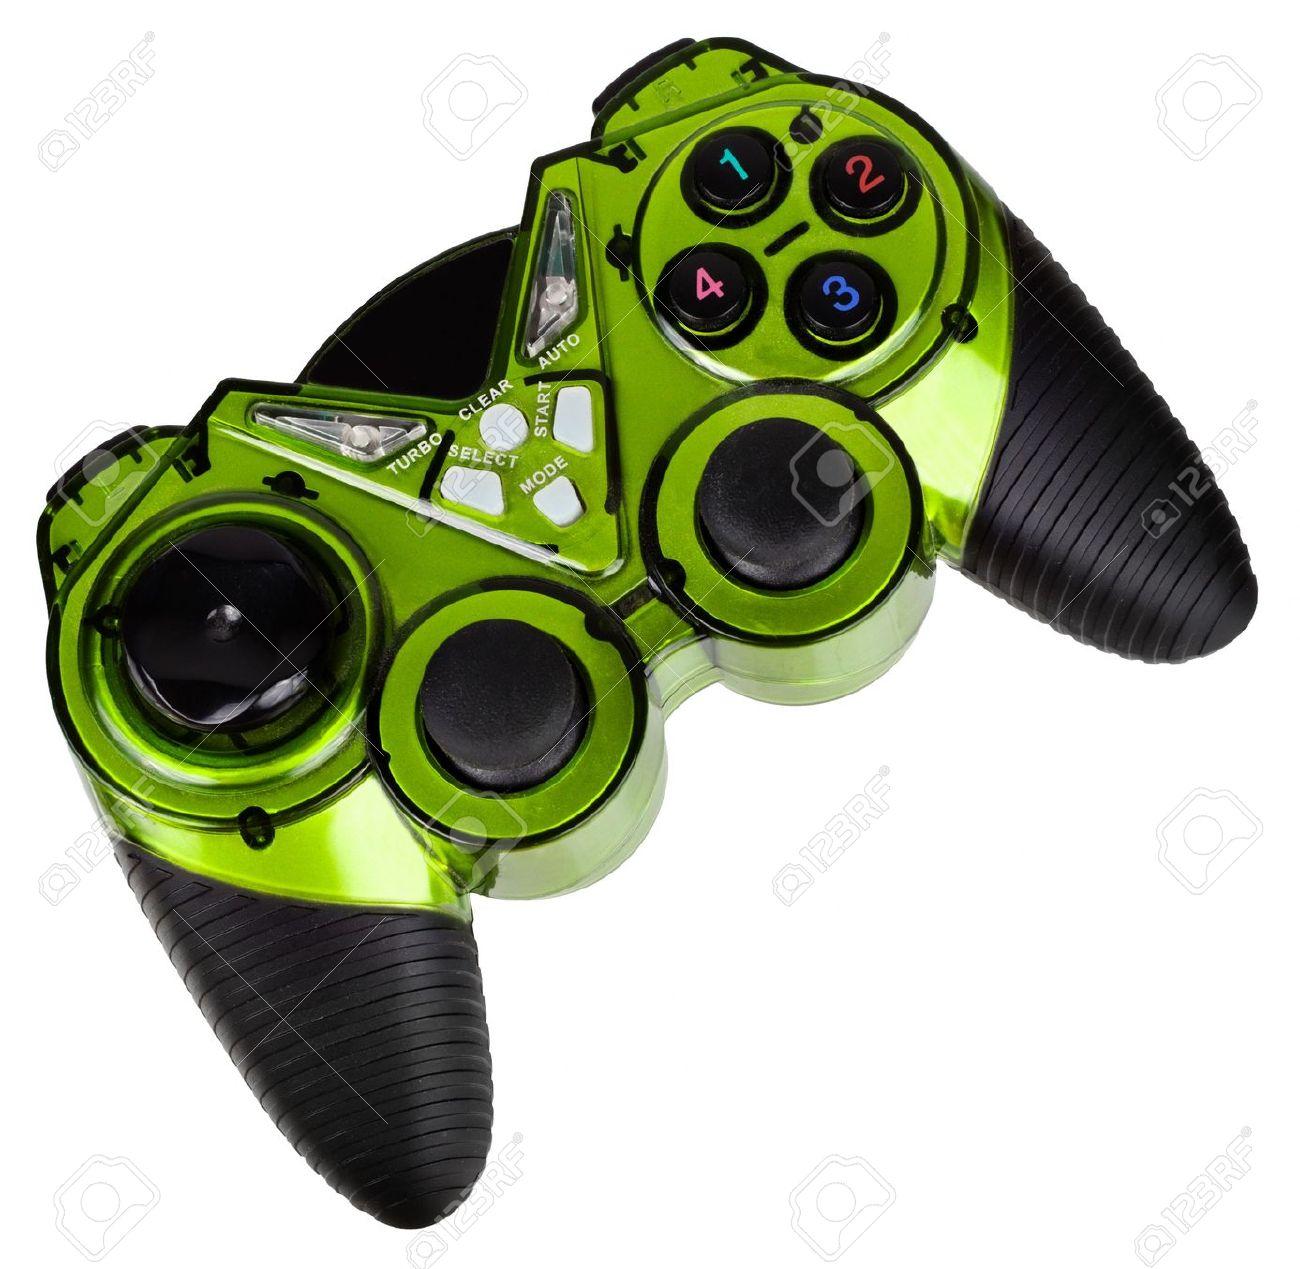 Controller clipart green Clipart Video games (72+) Clipart